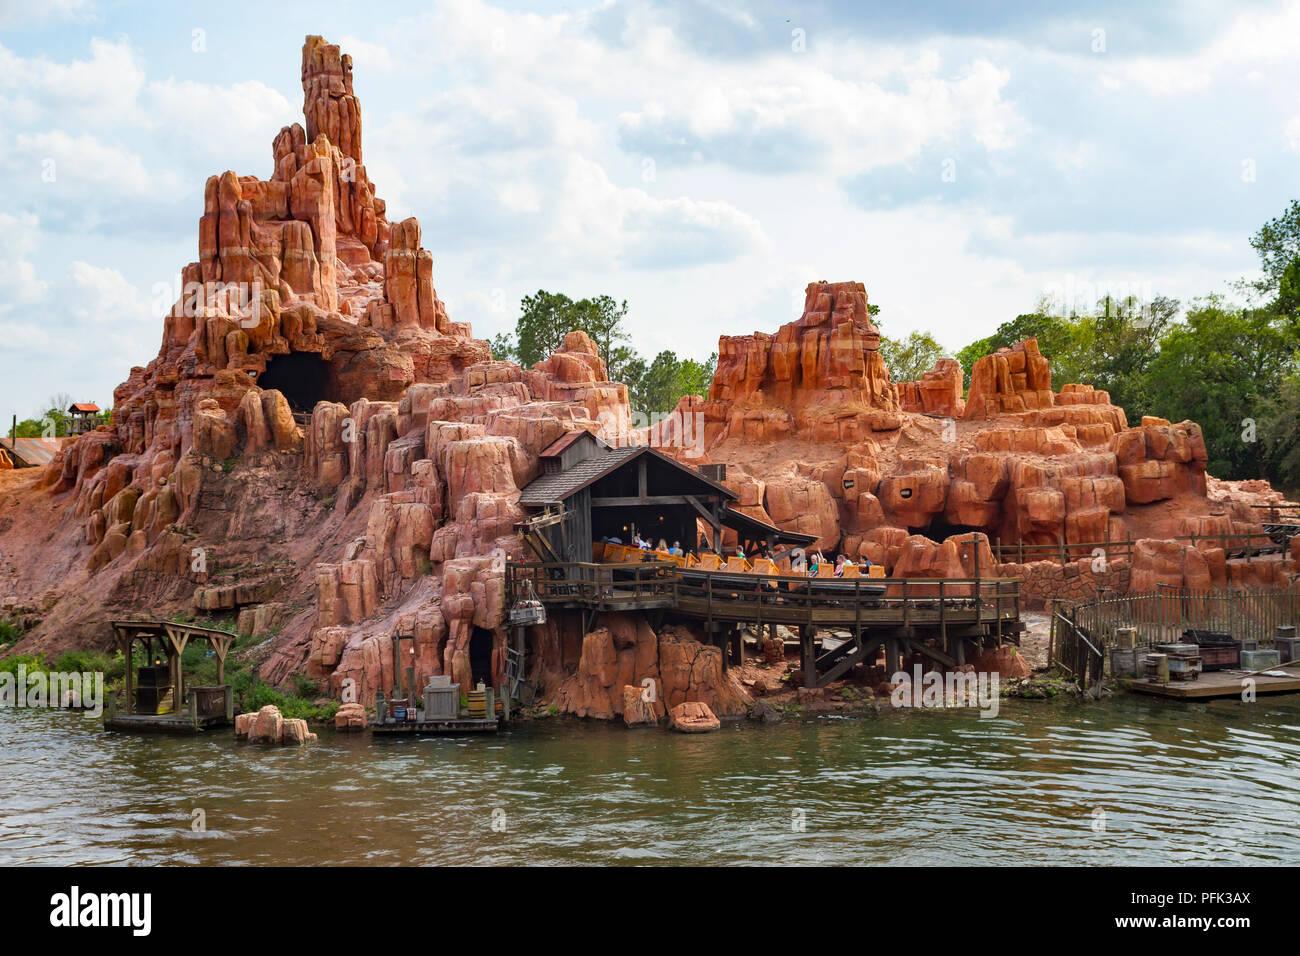 Big Thunder Mountain Railroad ride in Magic Kindgom, Walt Disney World, Orlando, Florida. - Stock Image